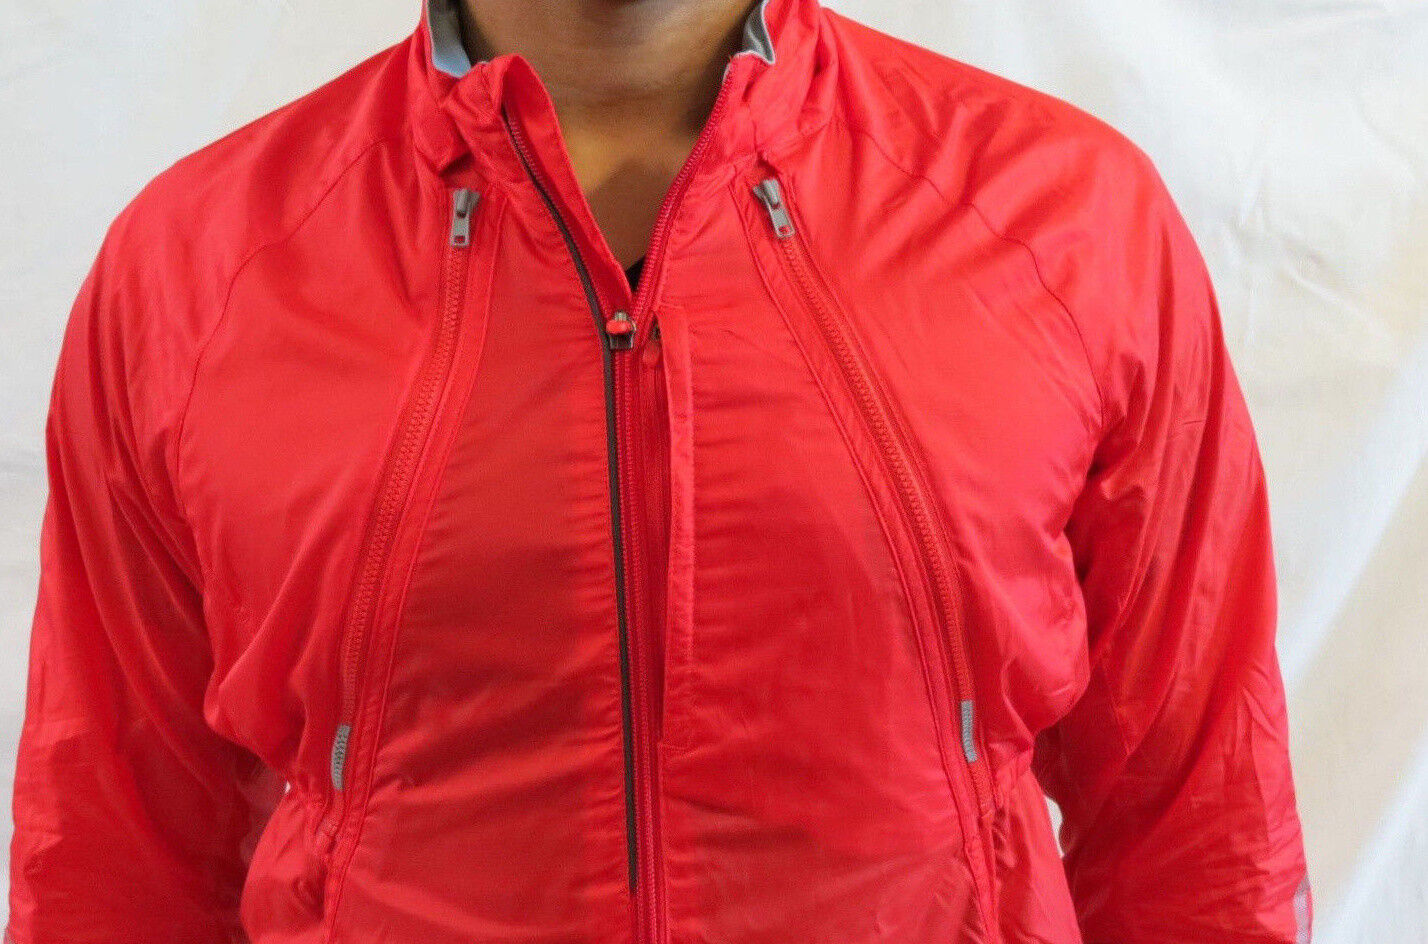 Adidas Sports Bike Jacket Windbreaker Red Zip Apart Medium Authentic New w/ Tags